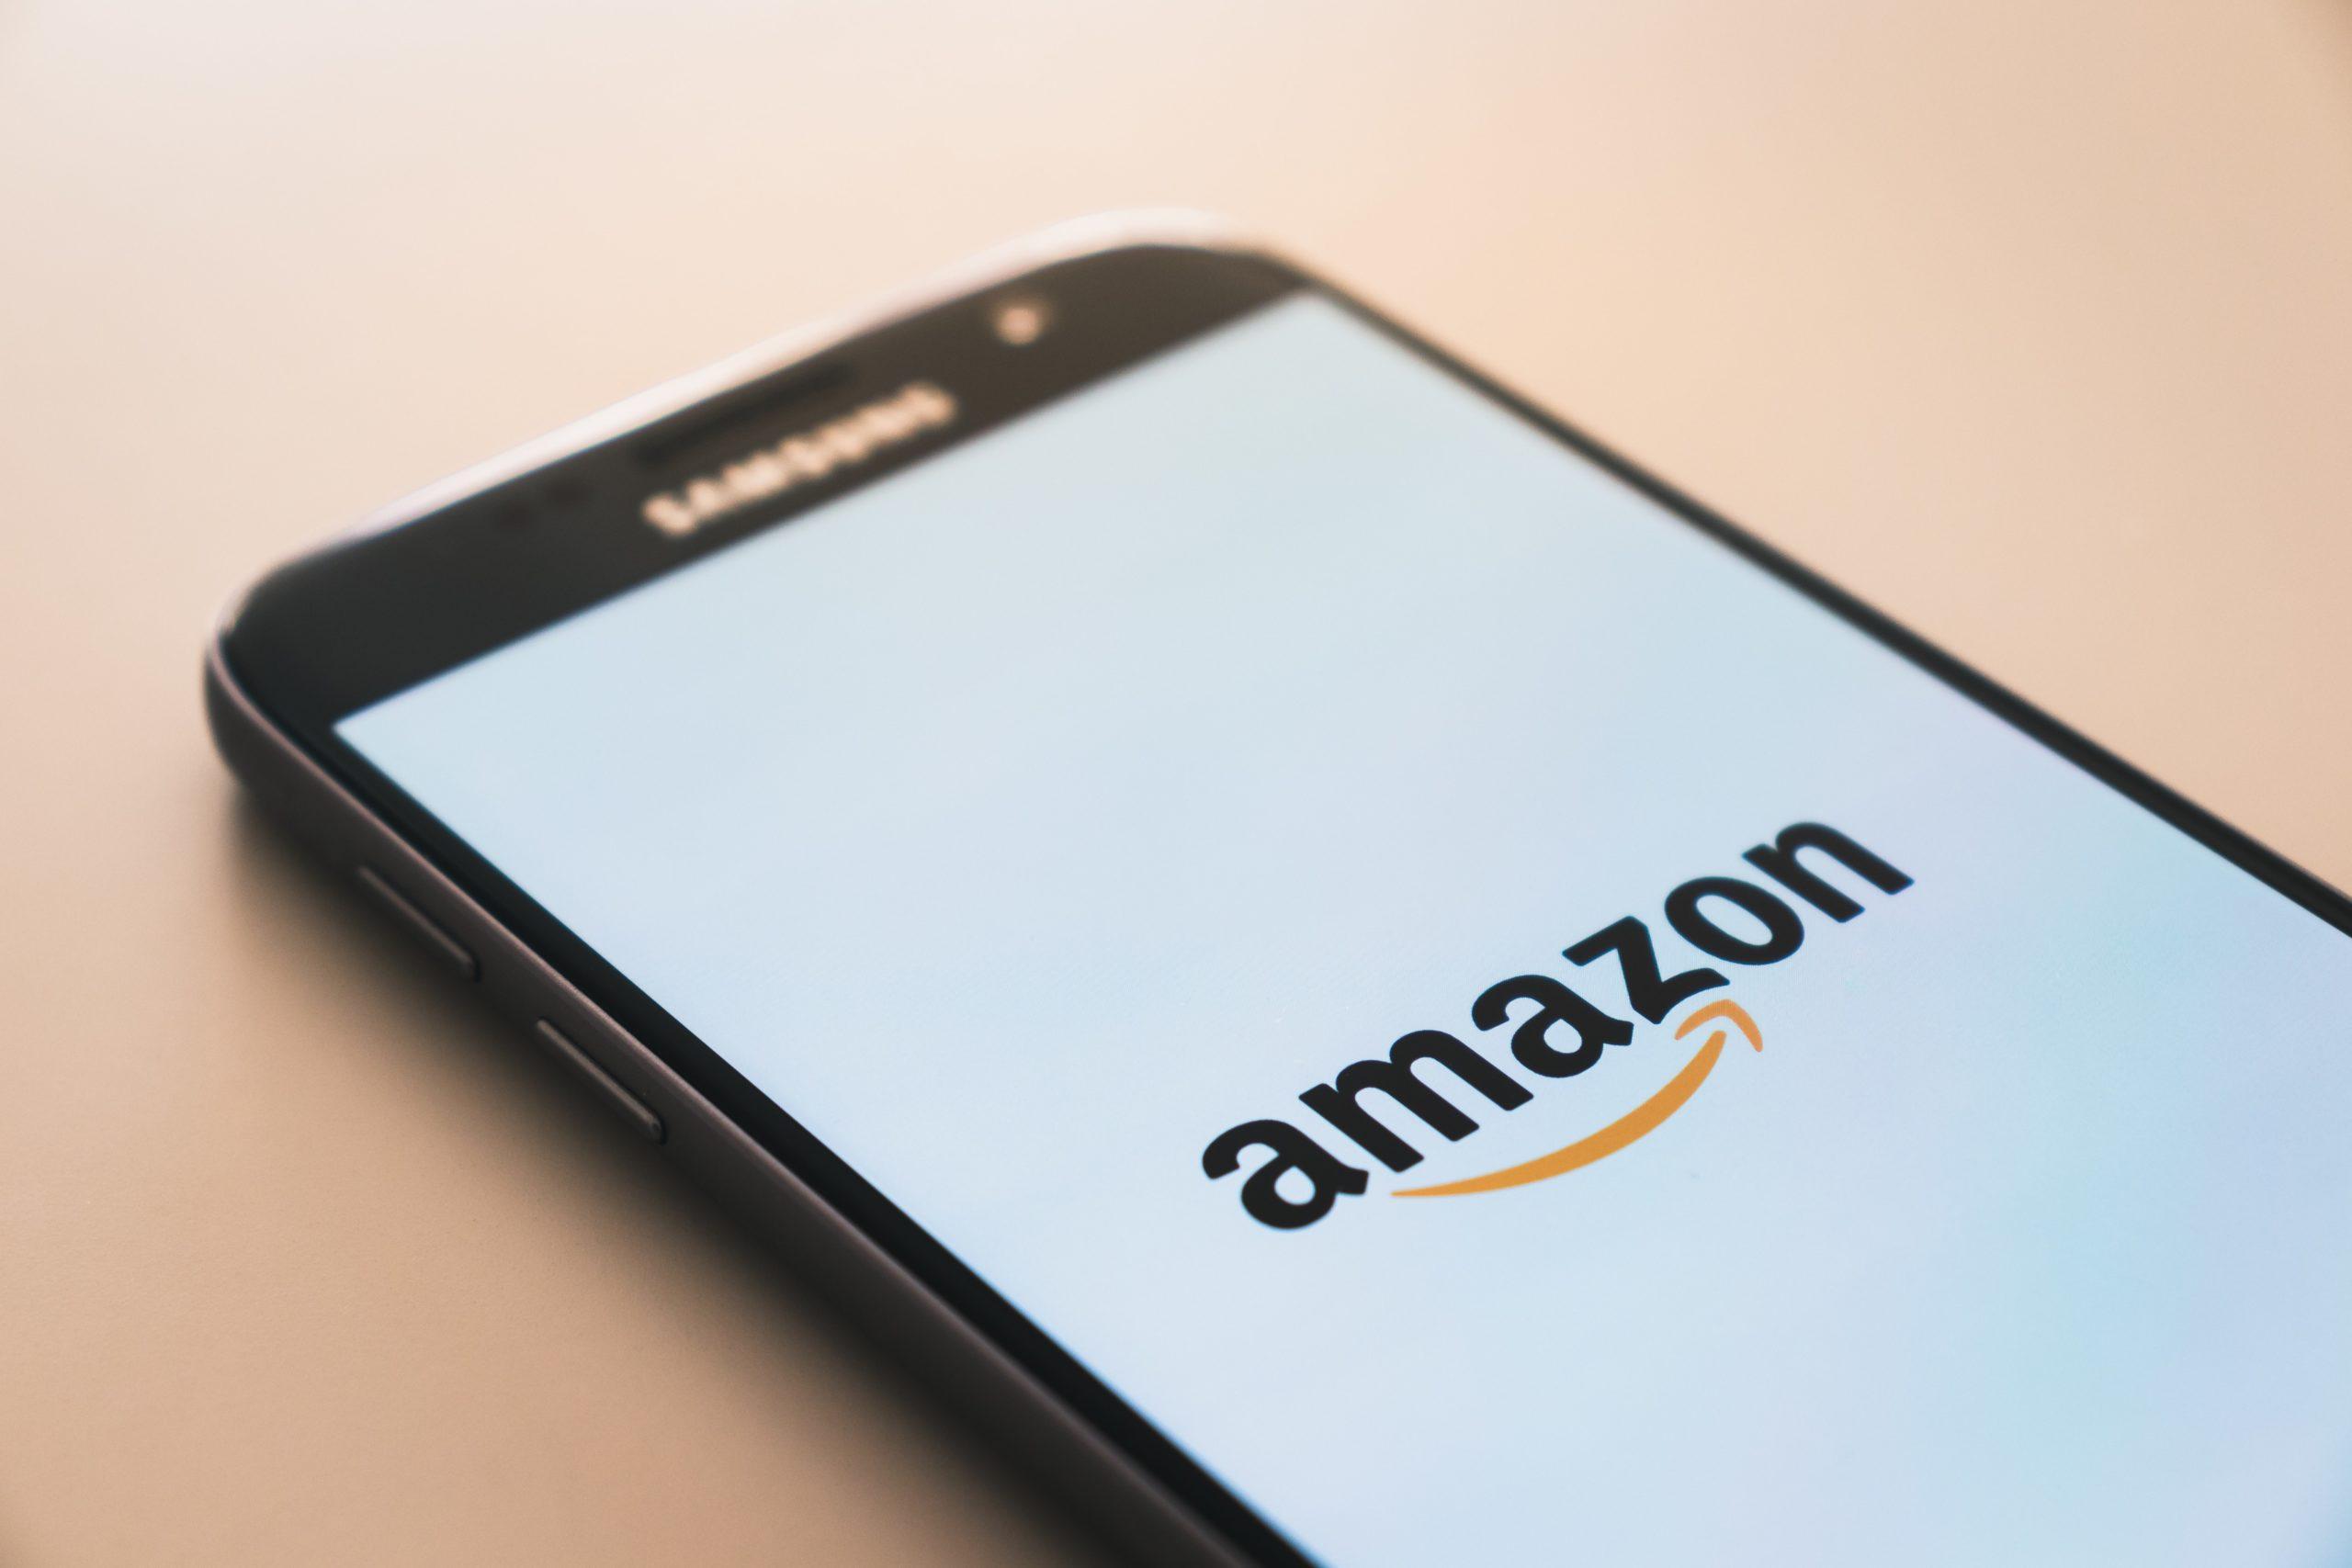 smart phone screen showing amazon logo to represent amazon SEO optimization